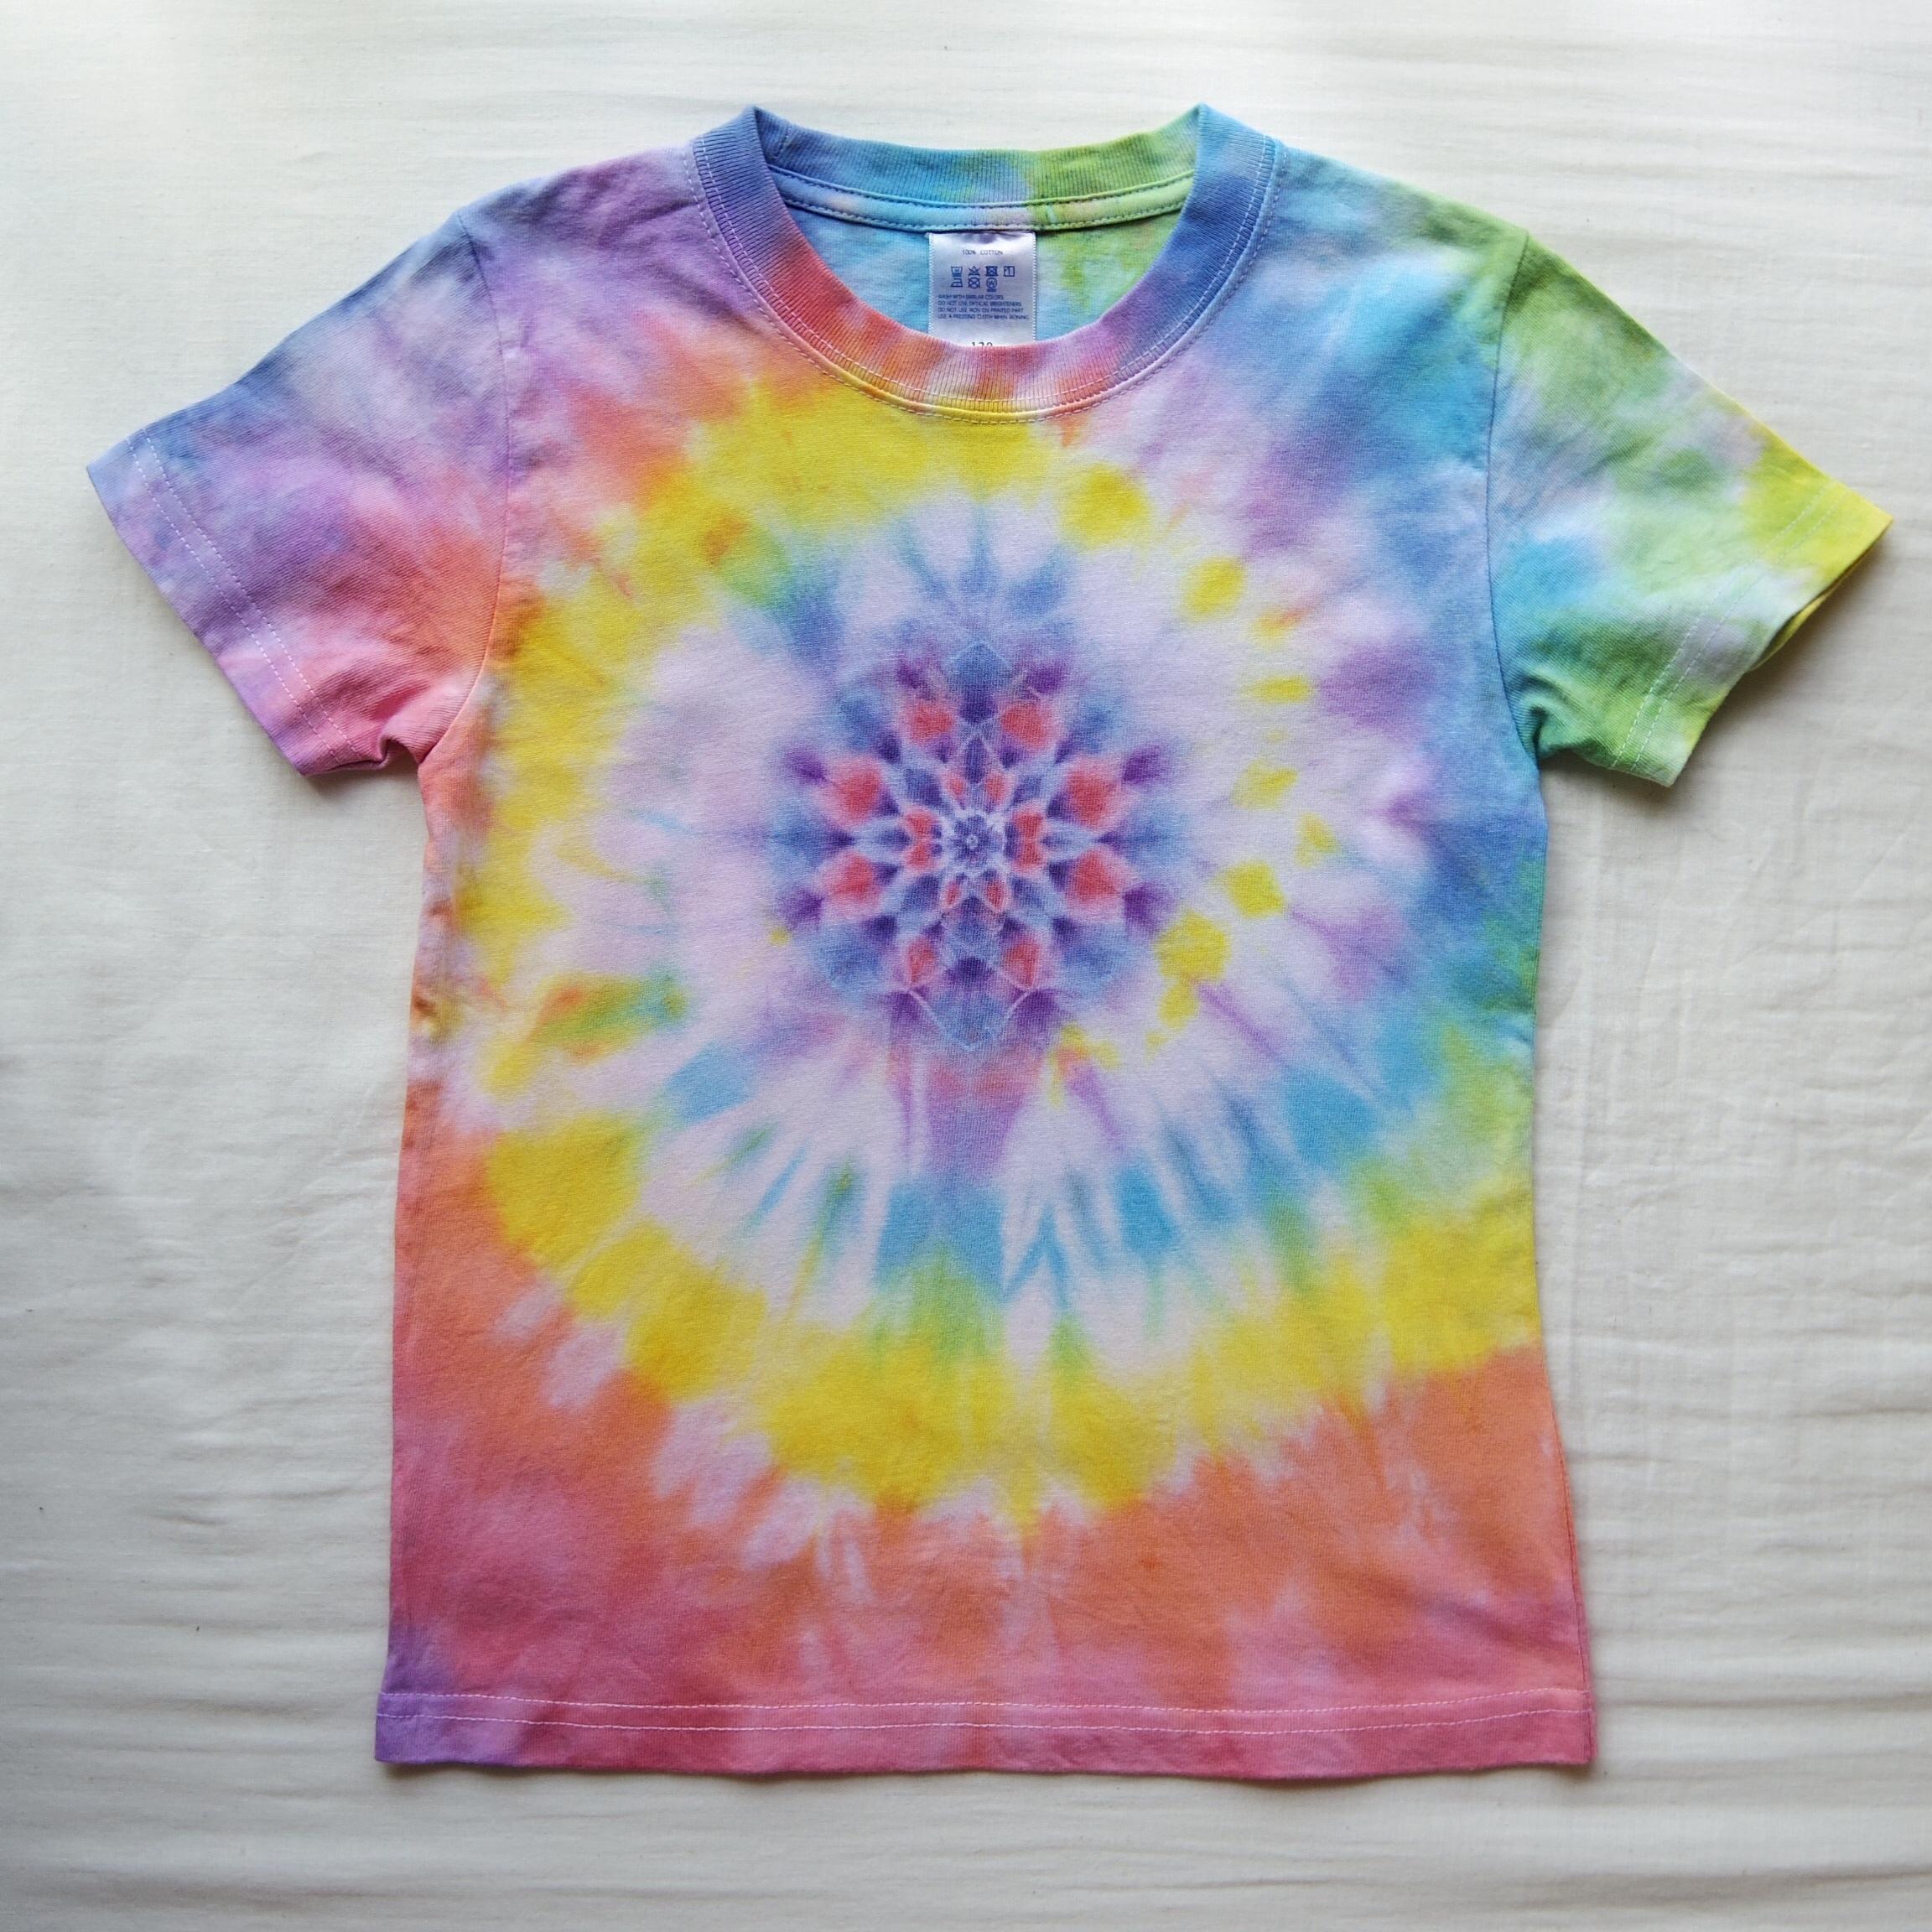 TKHOME FACTORY 曼荼羅染め×スパイラル タイダイ キッズTシャツ 120cm